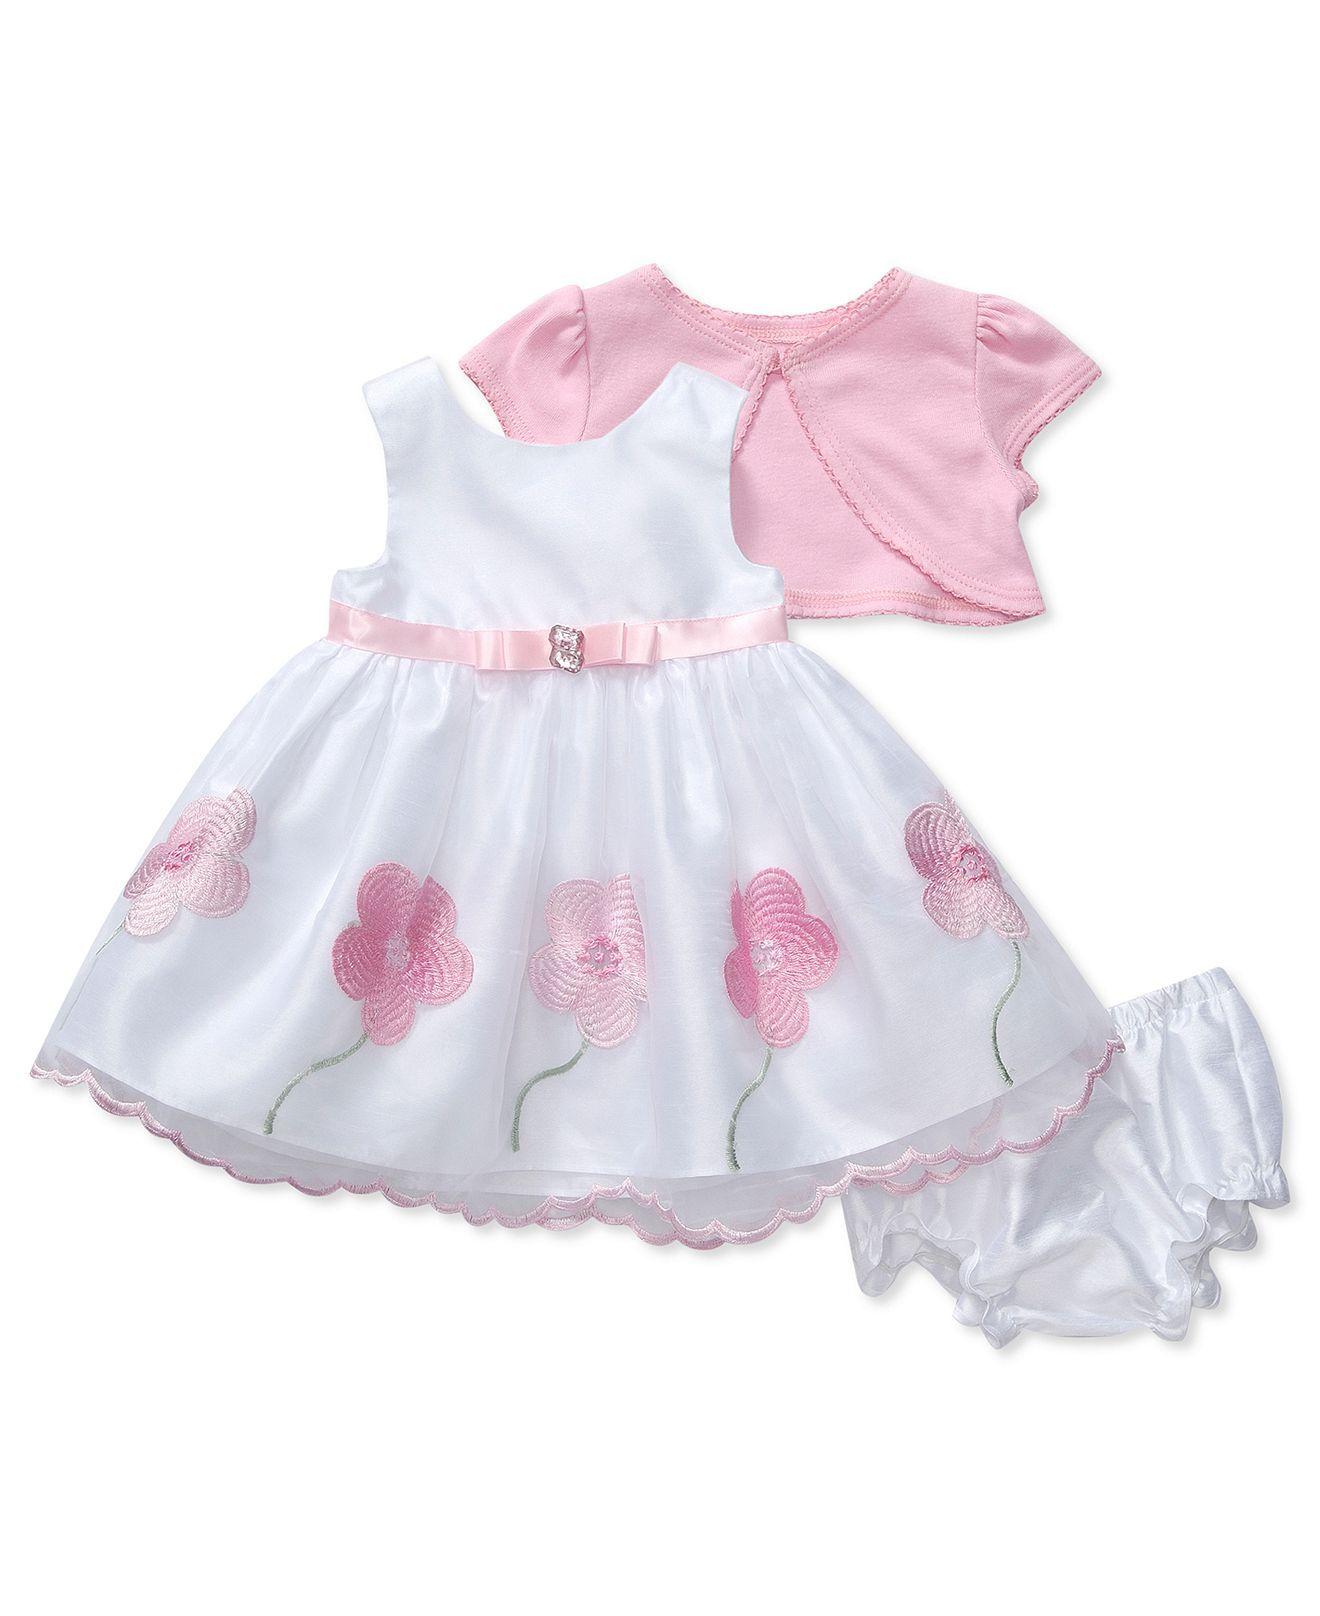 Sweet Heart Rose Baby Dress, Baby Girls Flower Applique Dress ...